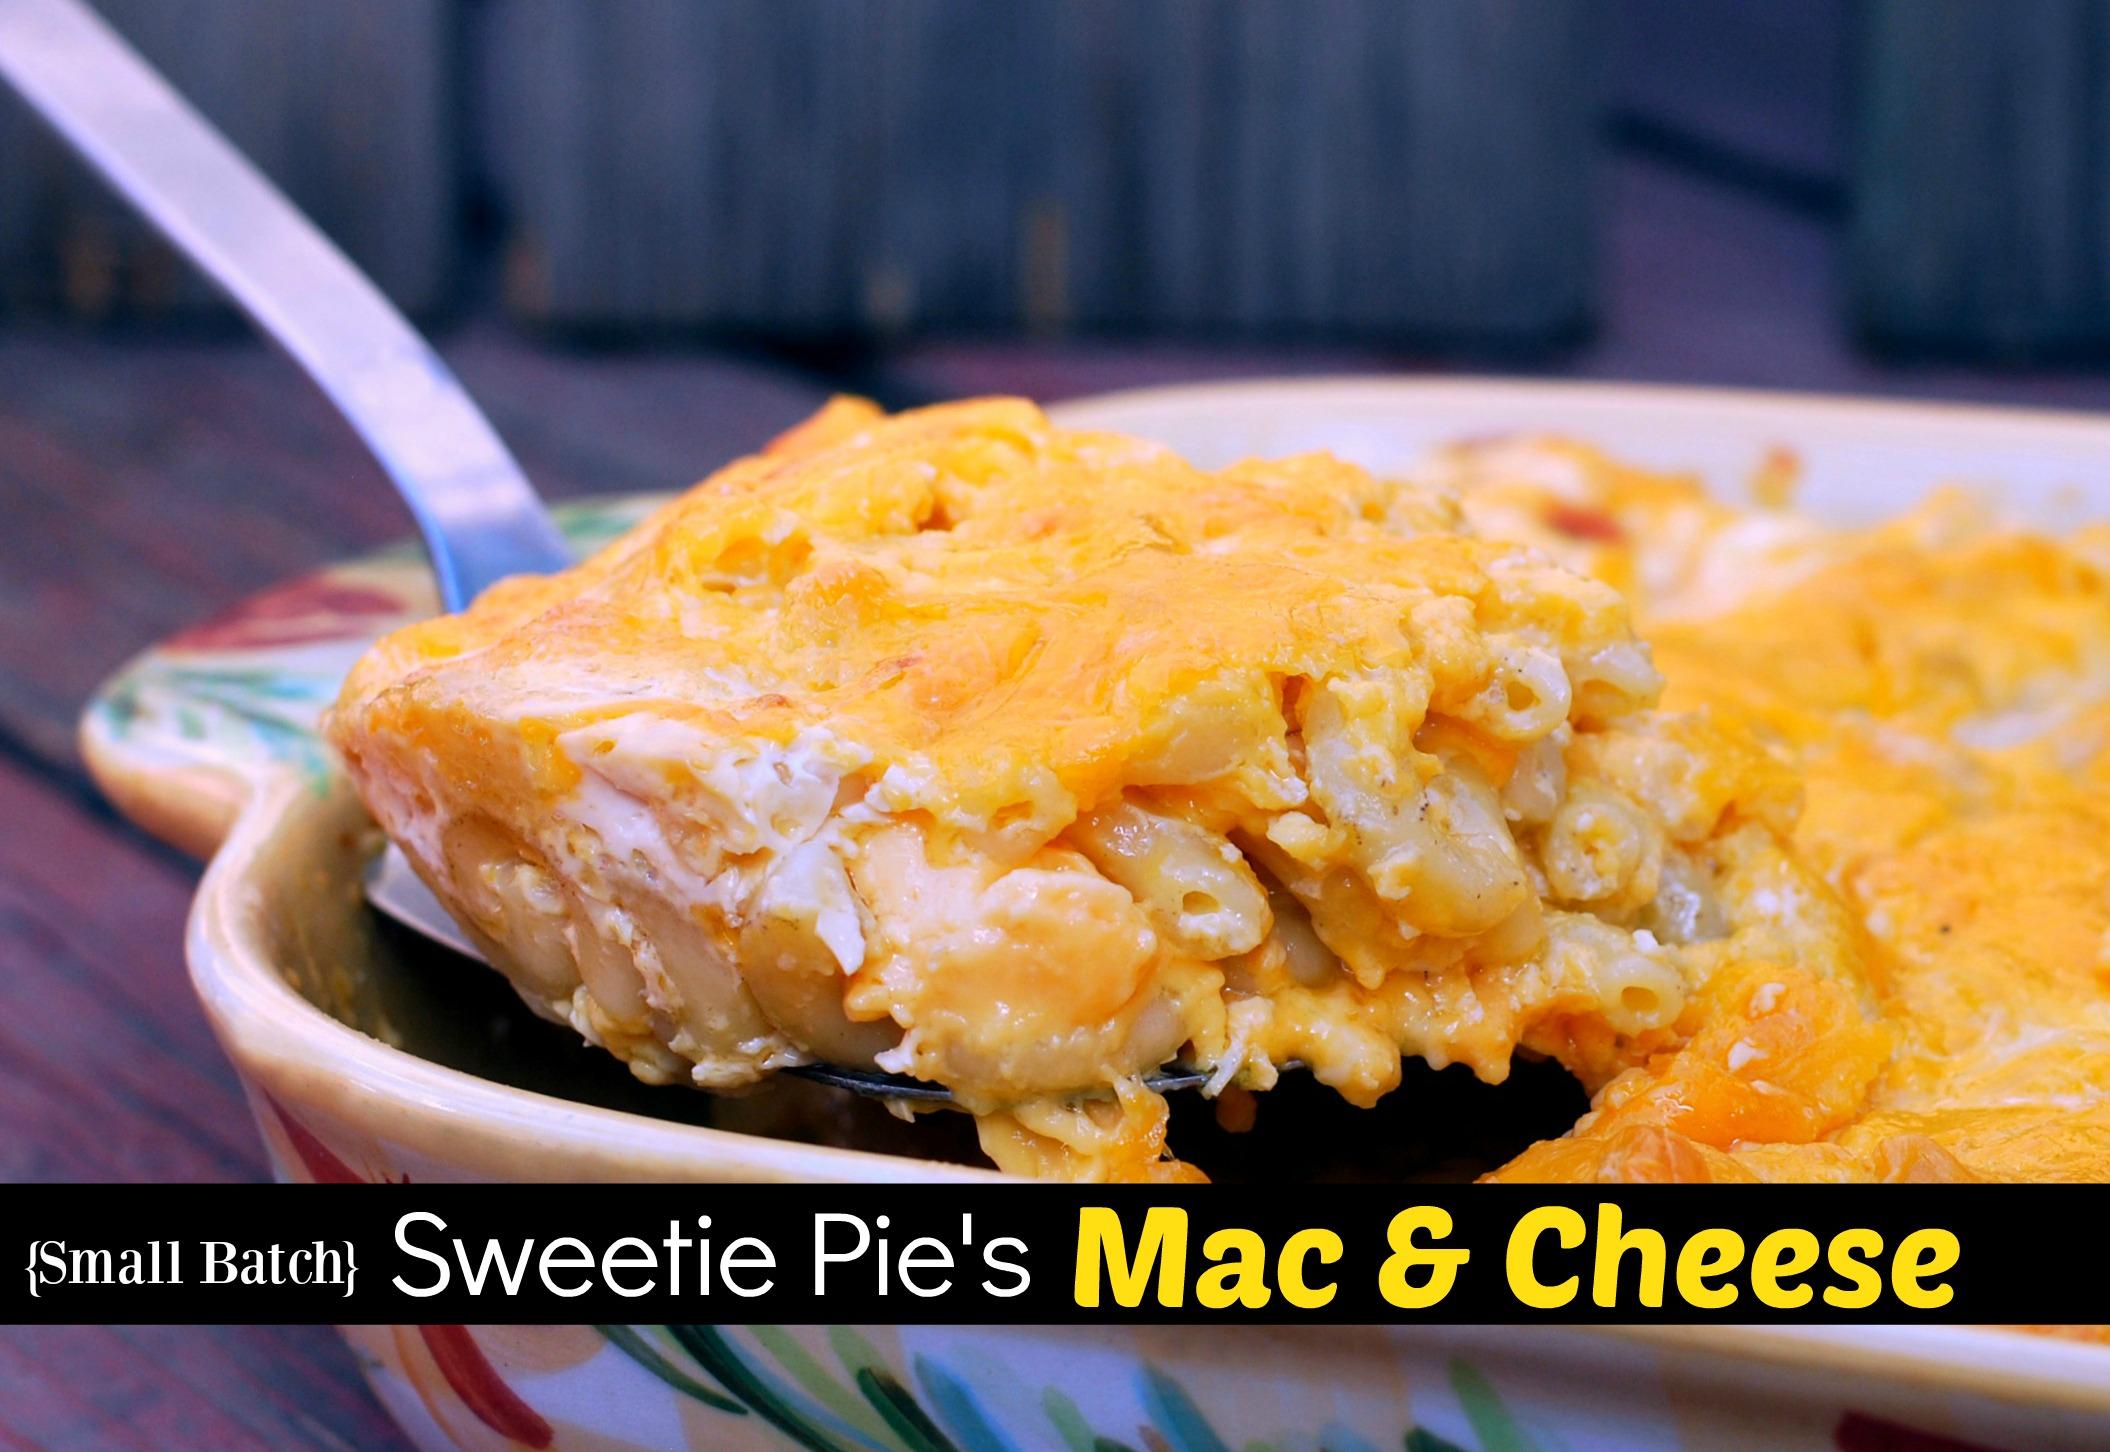 [Small Batch] Sweetie Pie's Mac & Cheese